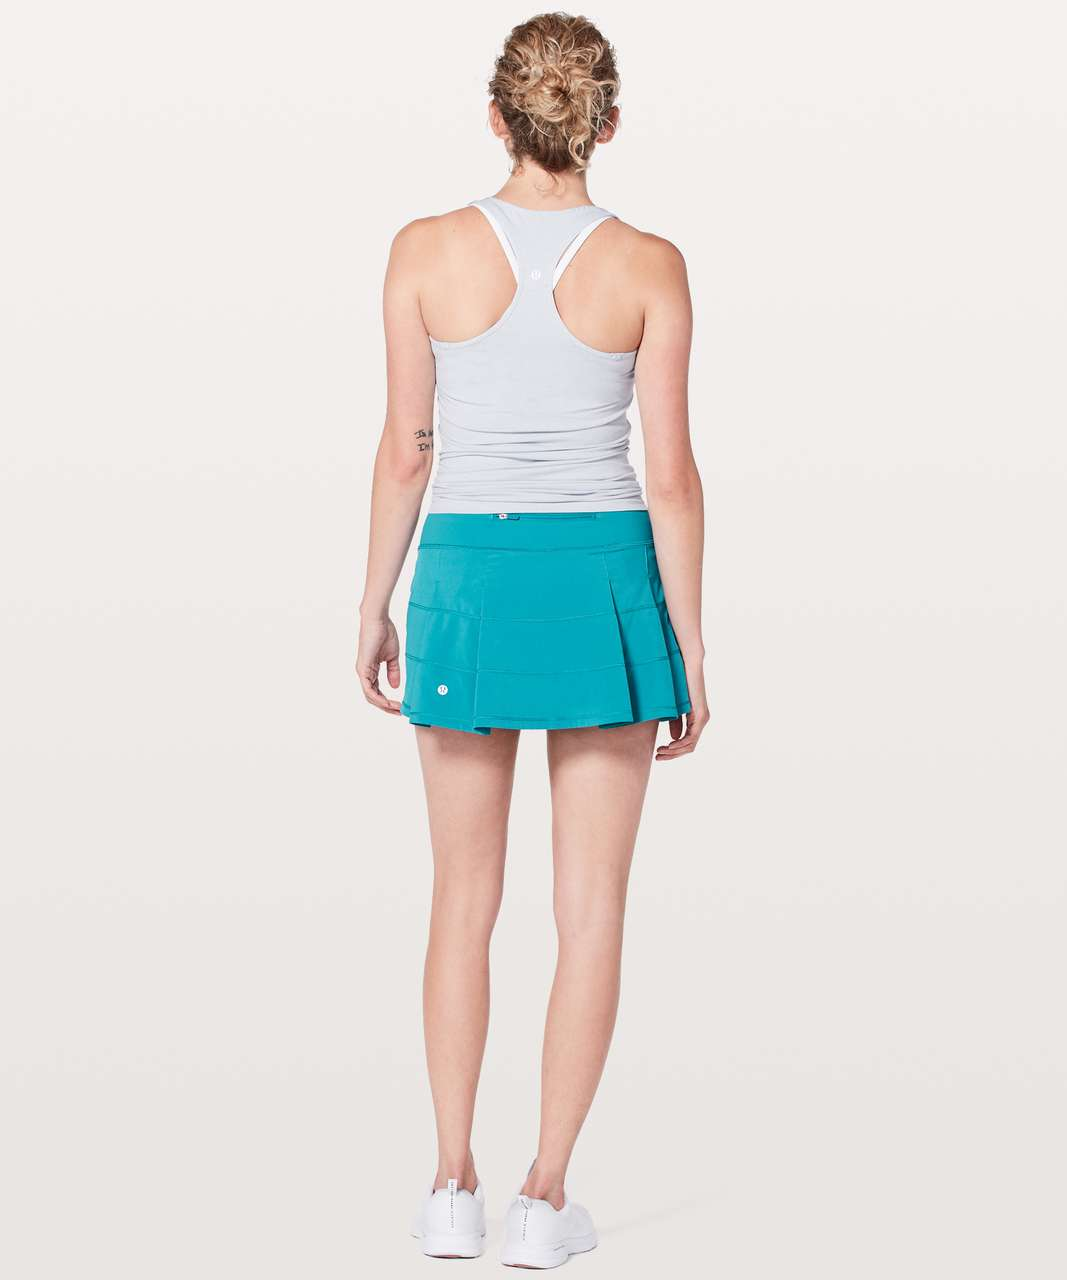 "Lululemon Pace Rival Skirt (Regular) *4-way Stretch 13"" - Teal Blue"